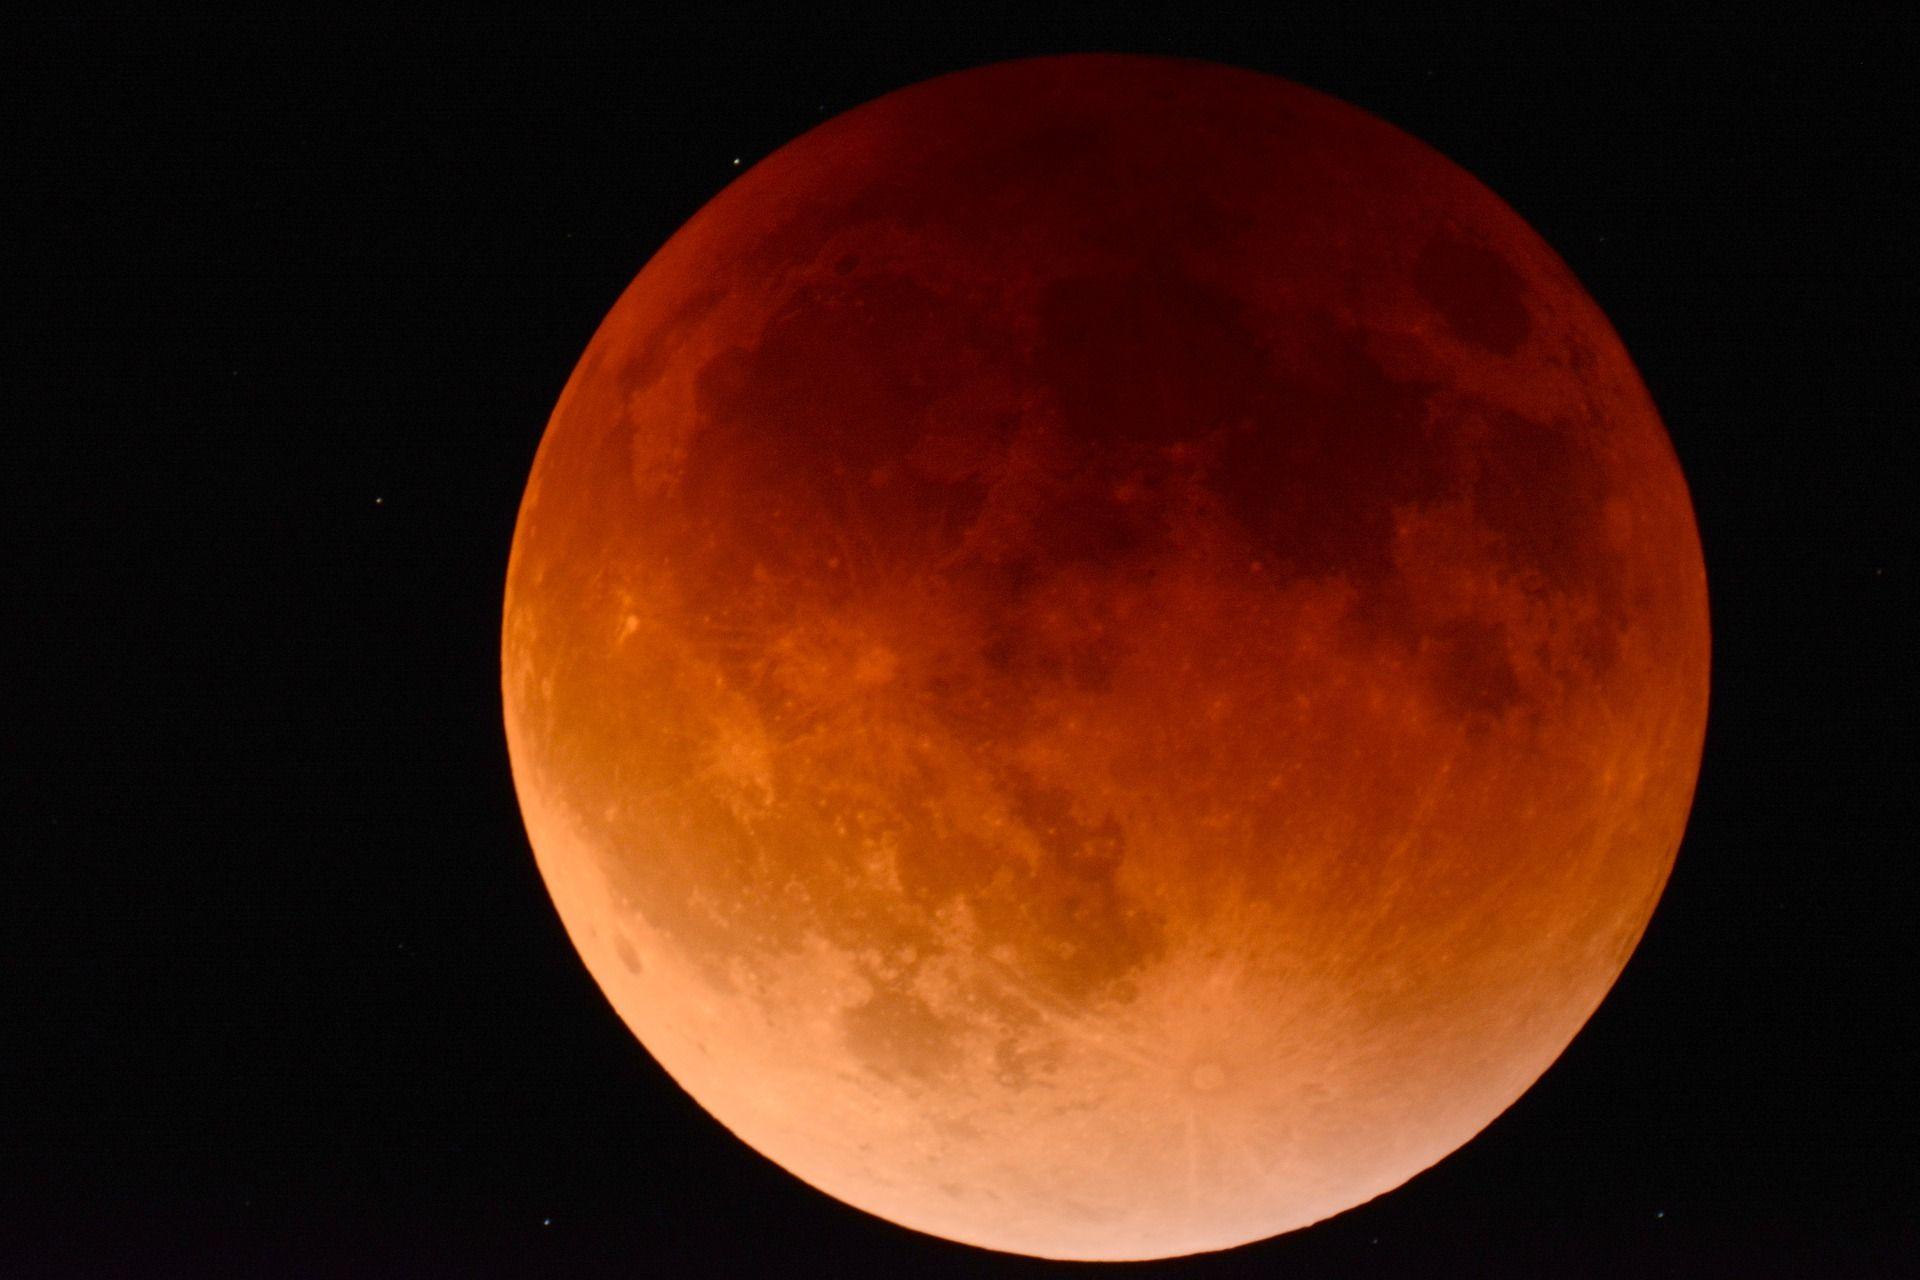 21++ Why does the moon look orange tonight ideas